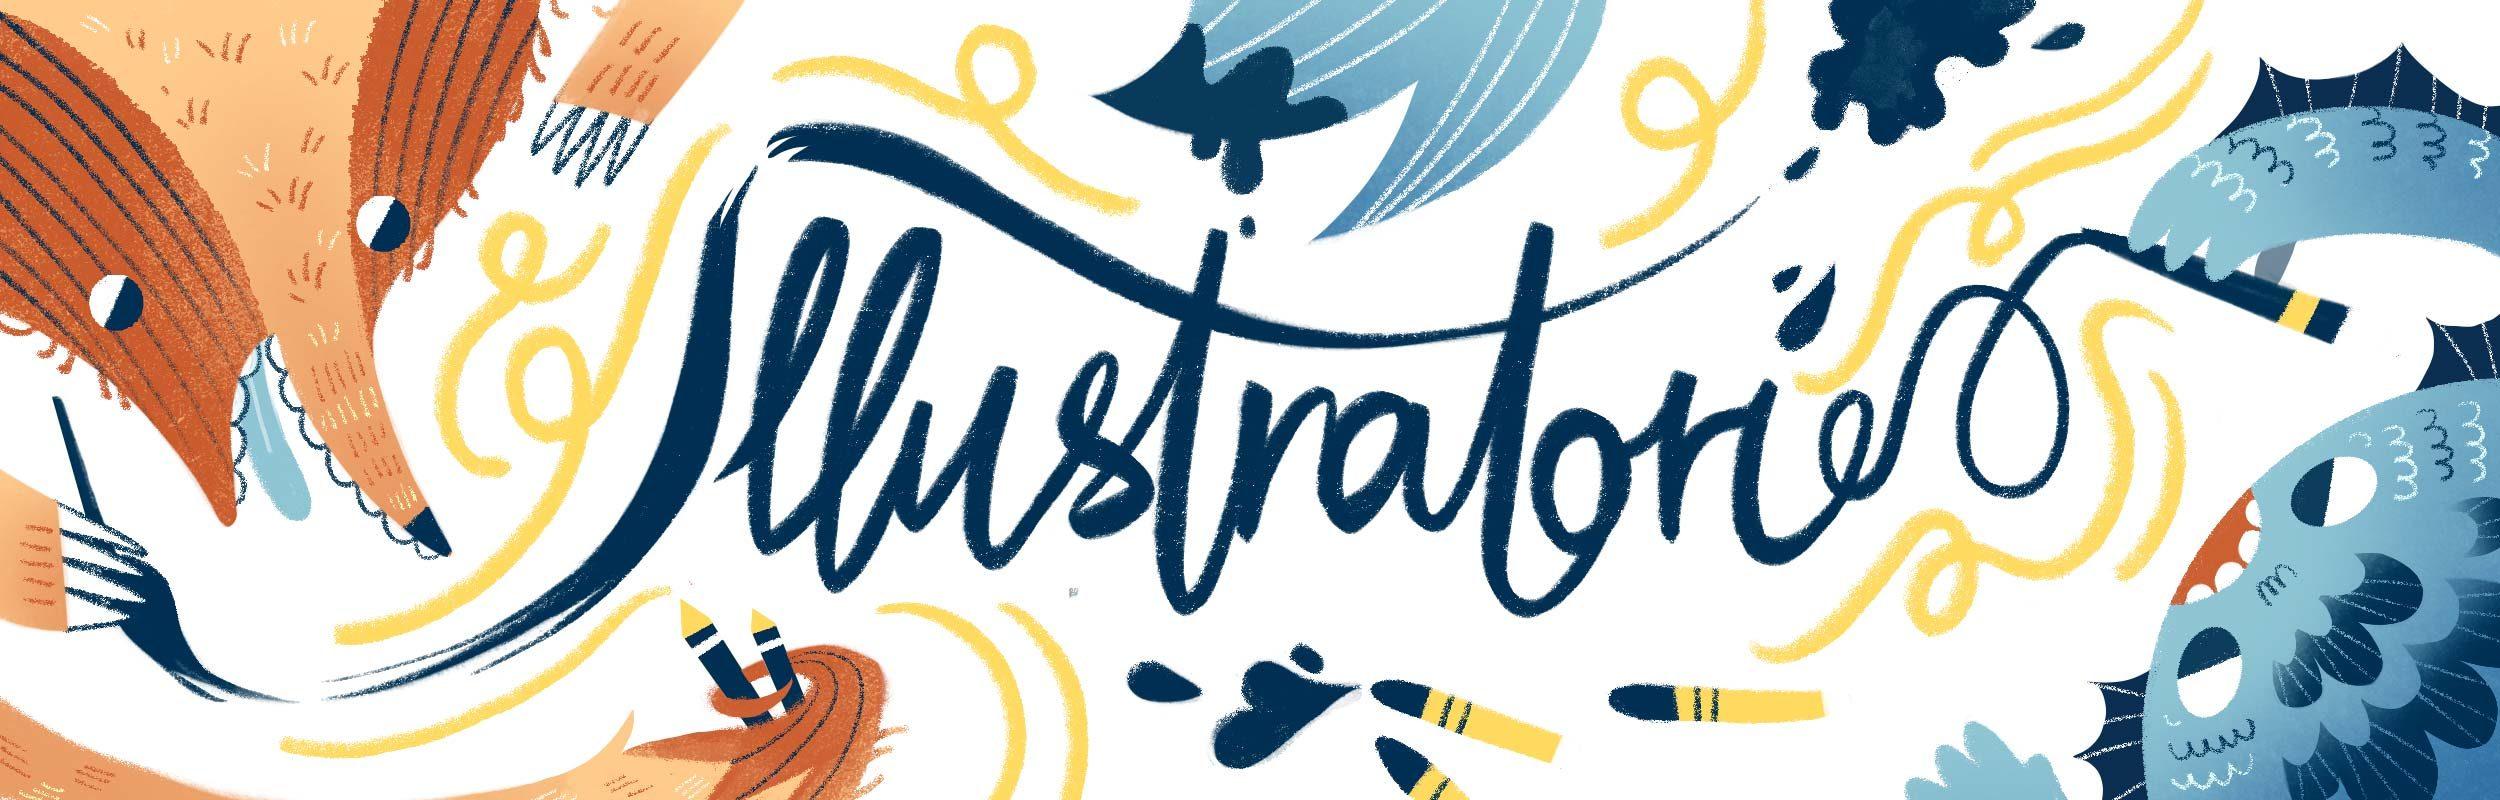 Header_Illustratori